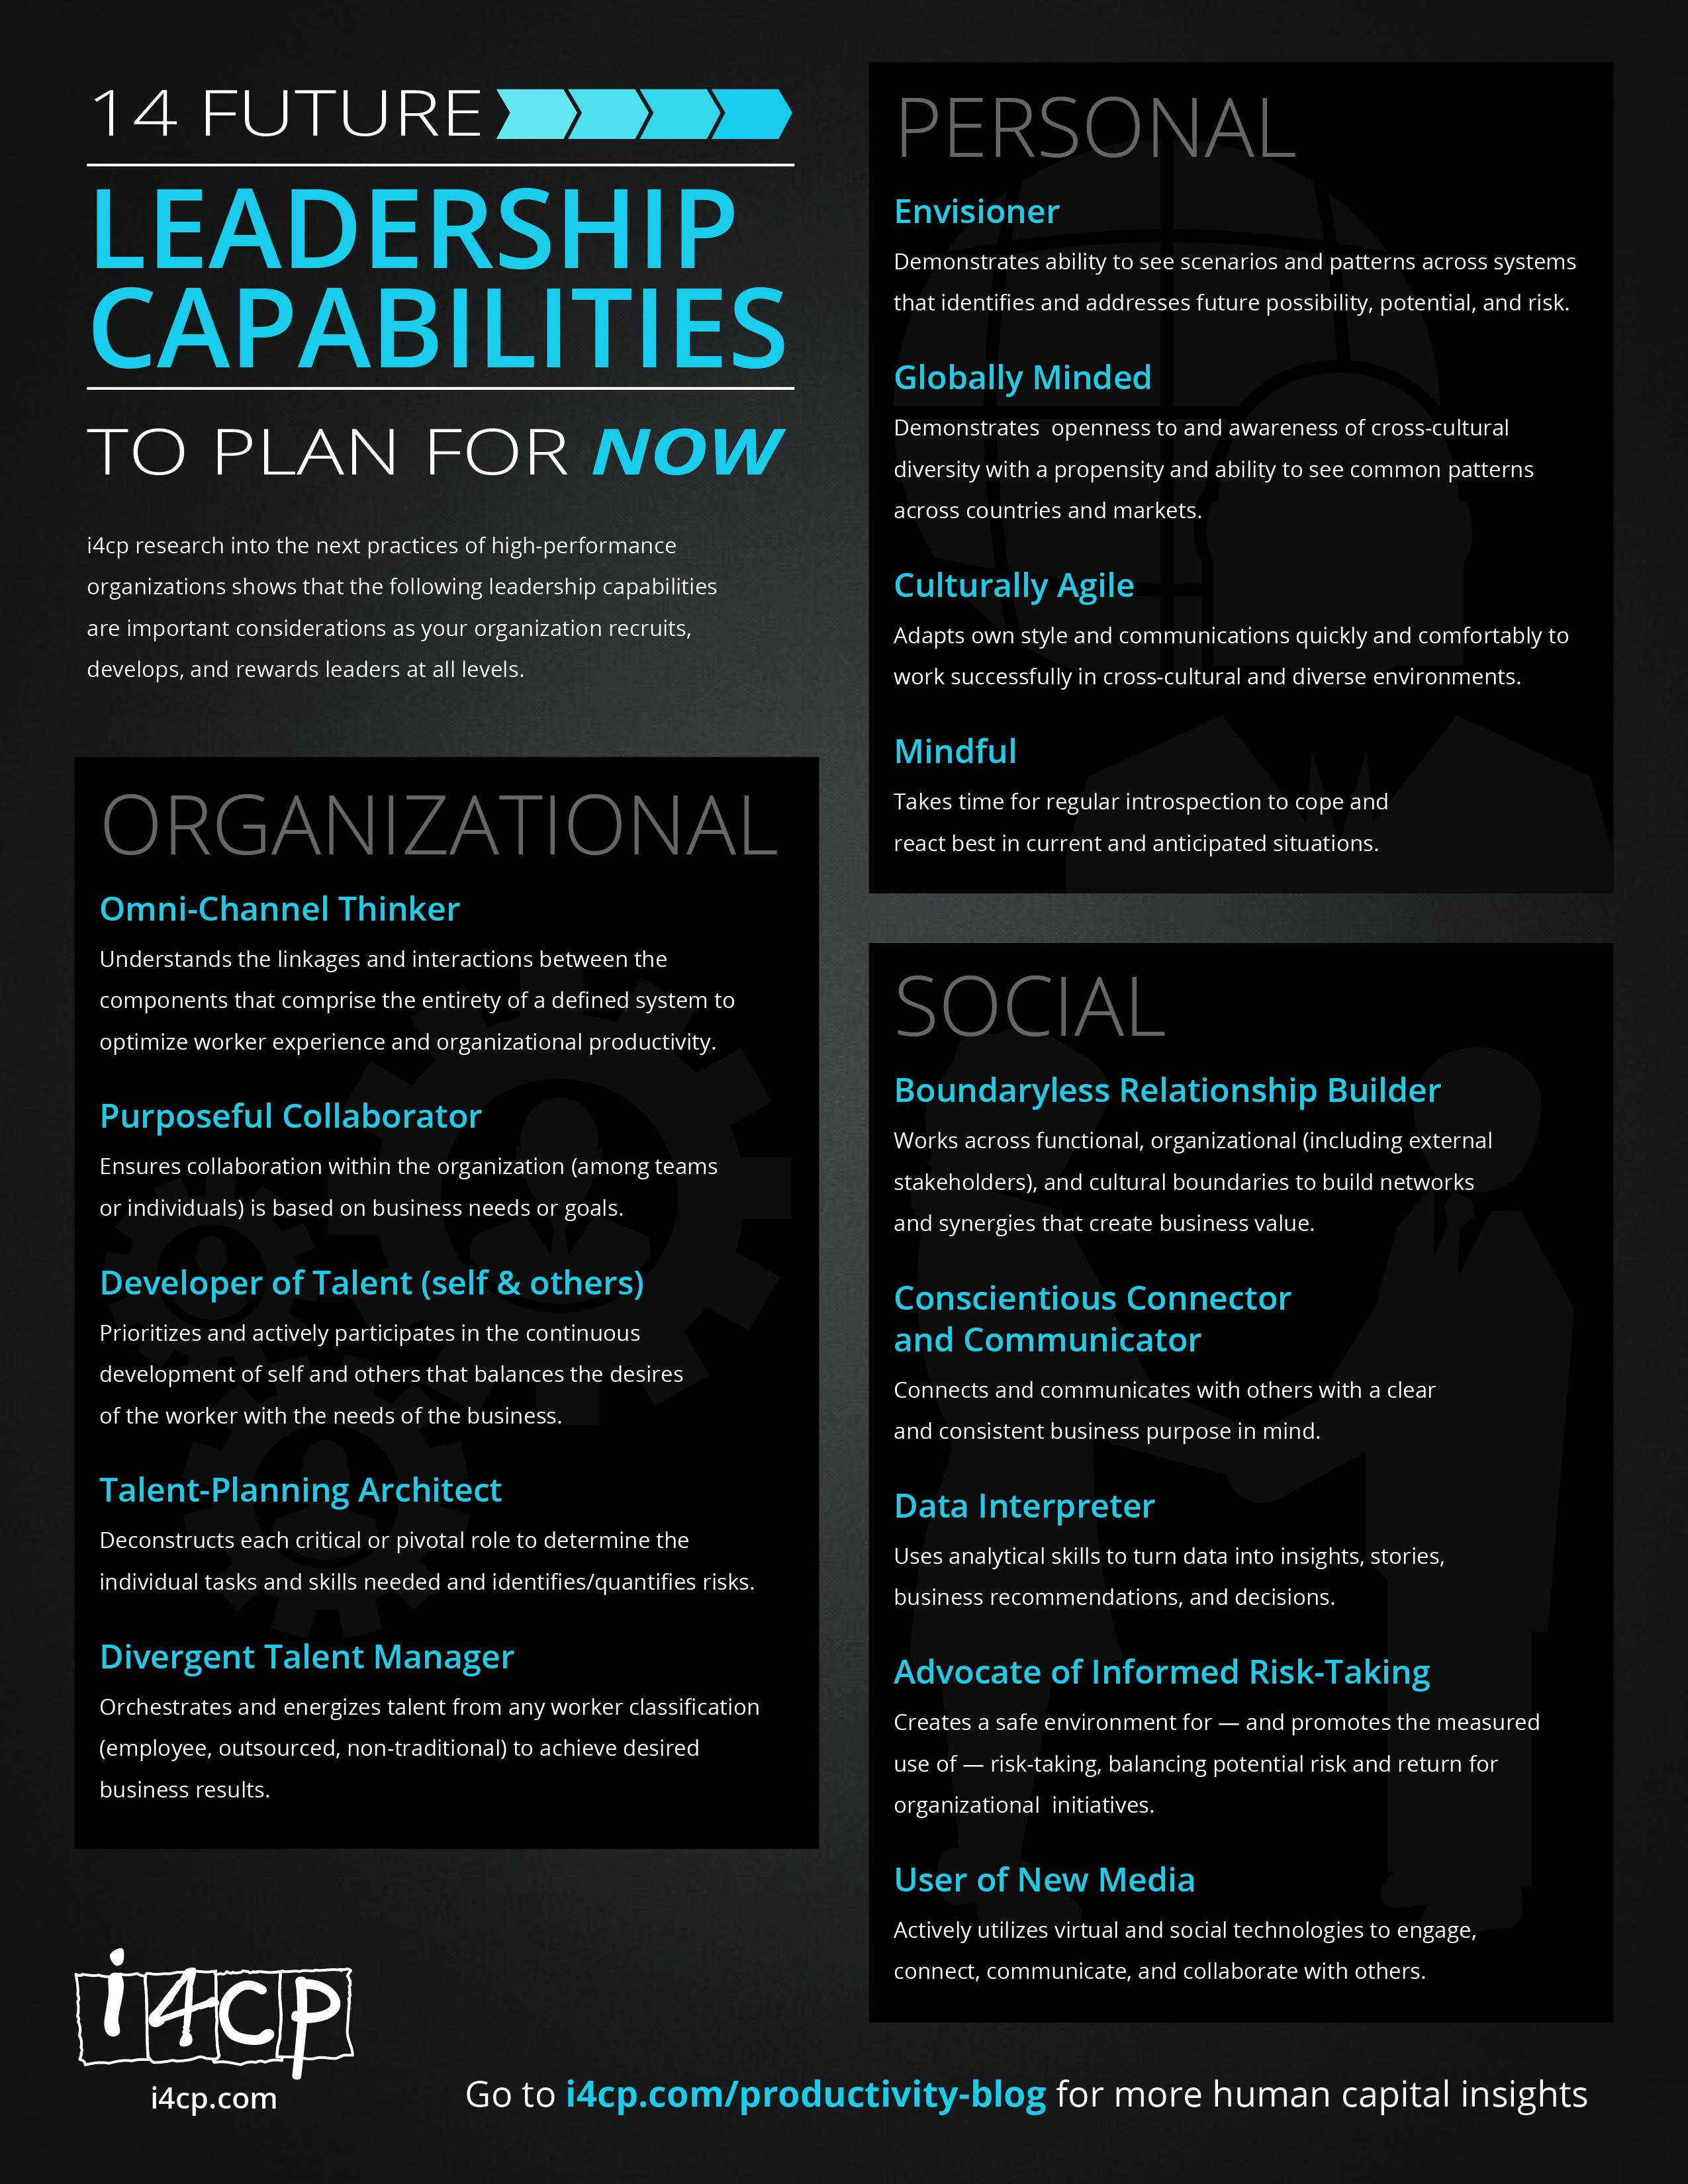 Future Leadership Capabilities